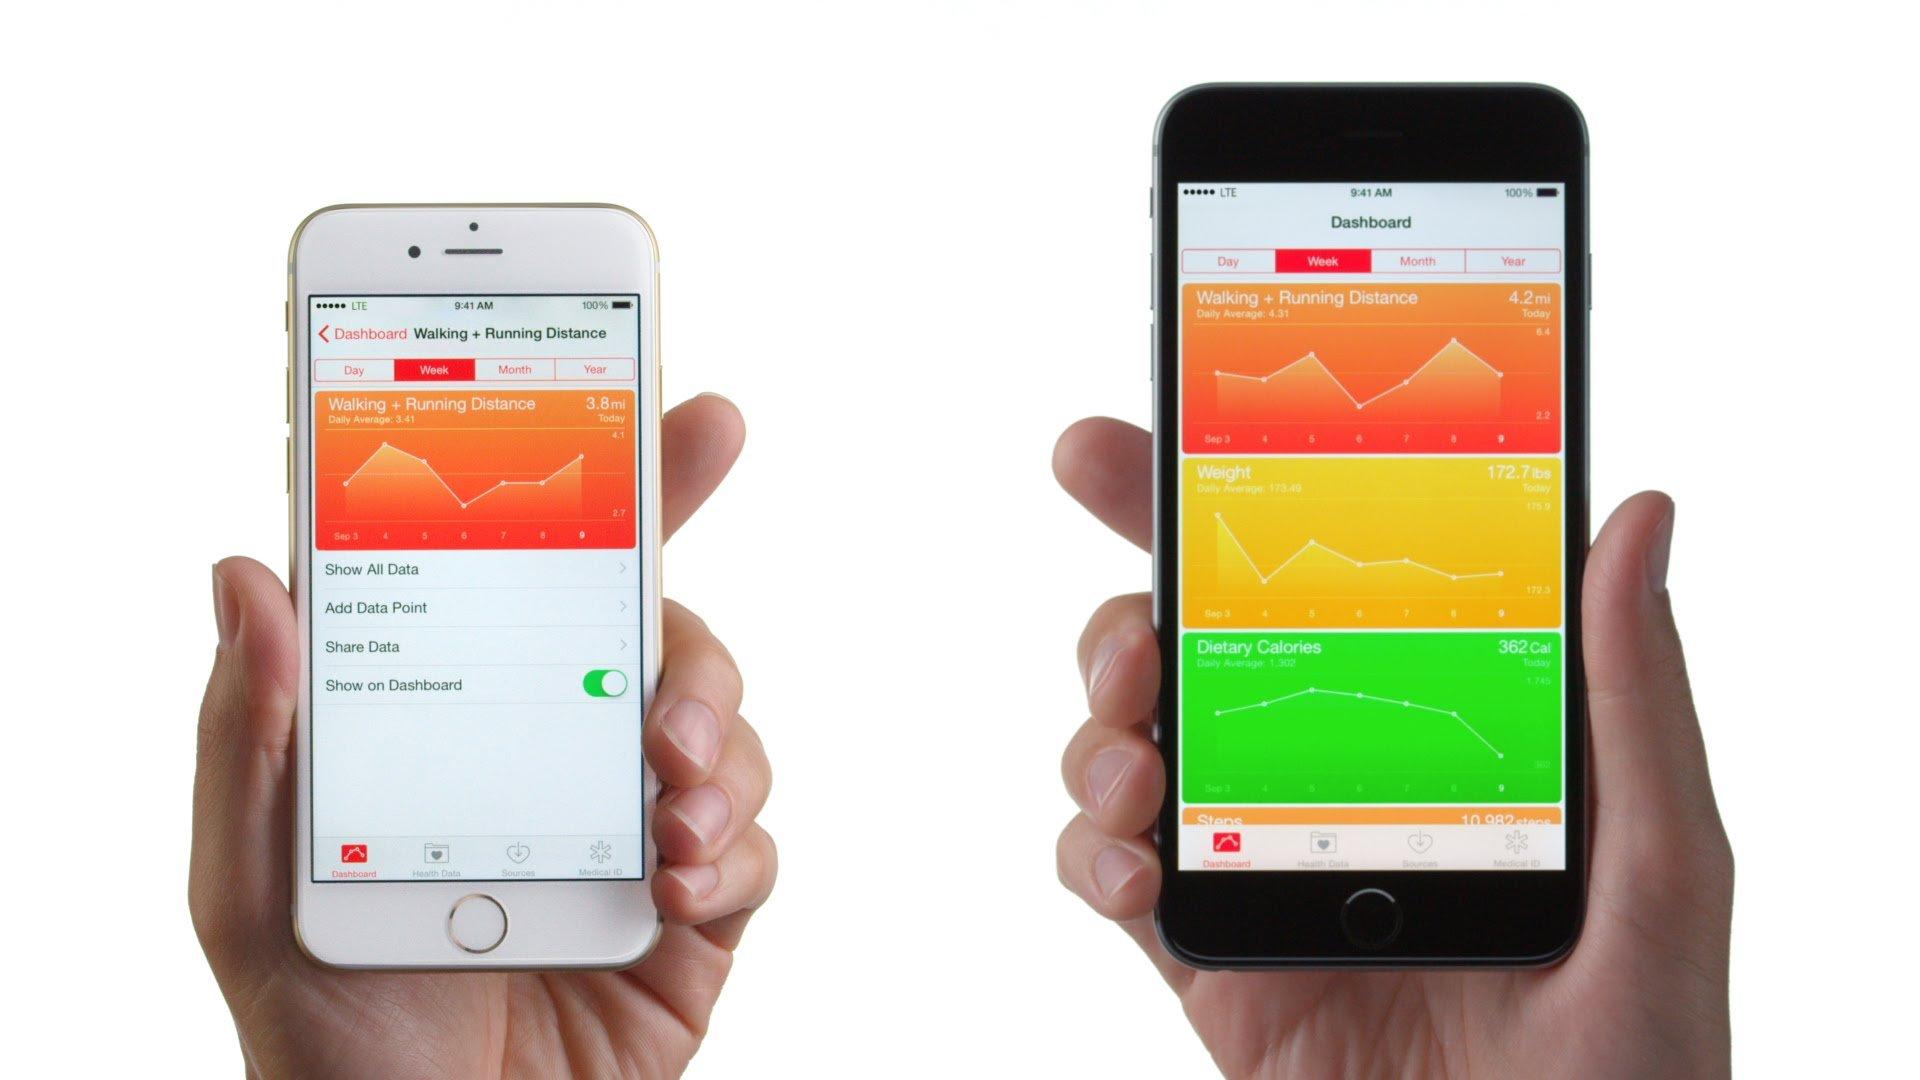 VIDEO: Apple Watch, iPhone 6, iPhone 6 Plus! 1